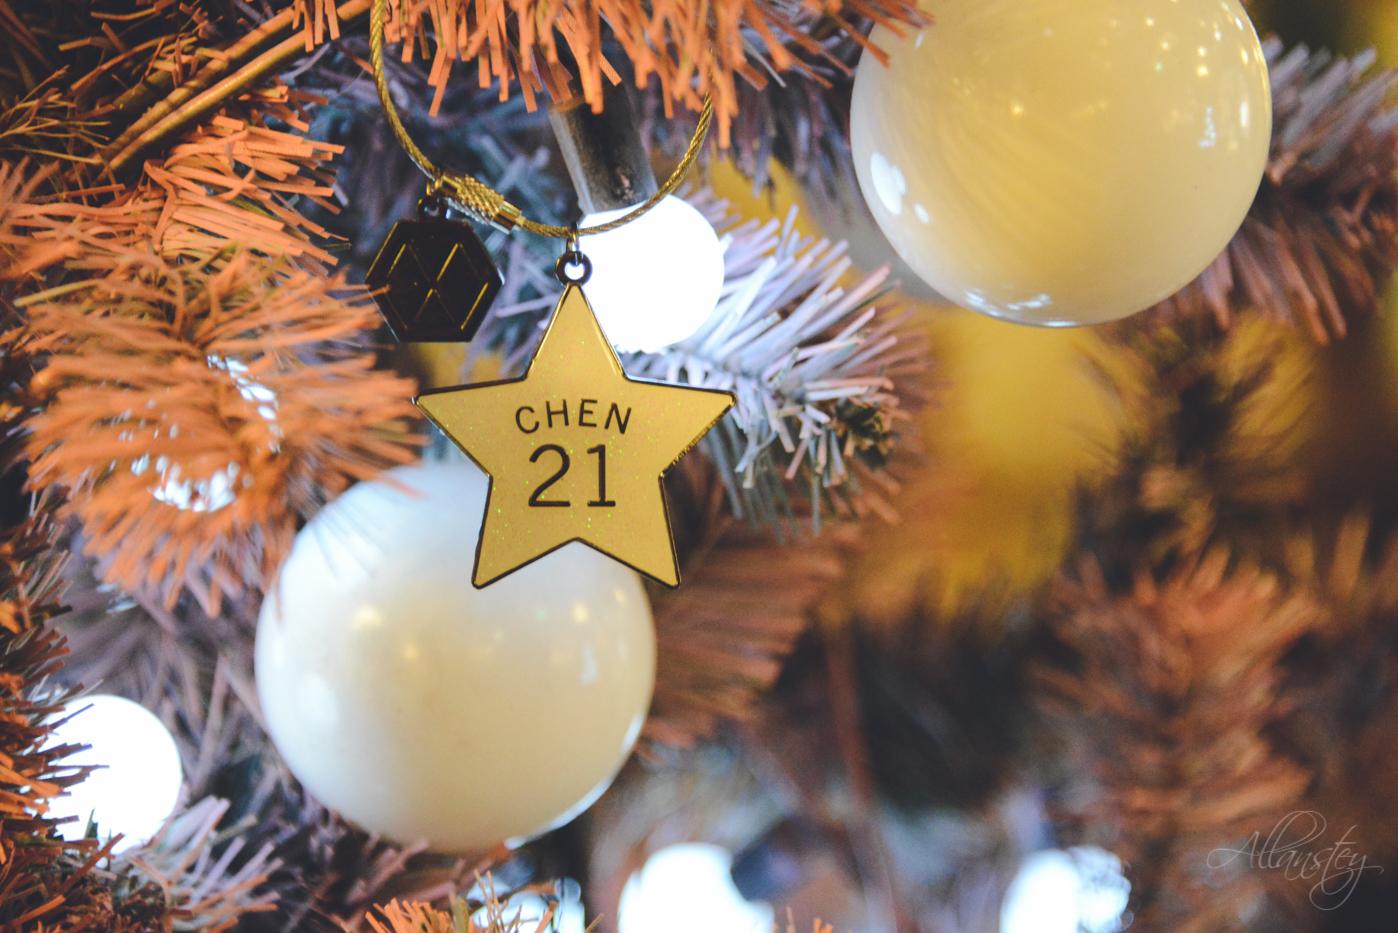 Christmas tree decoration, EXO Chen 21